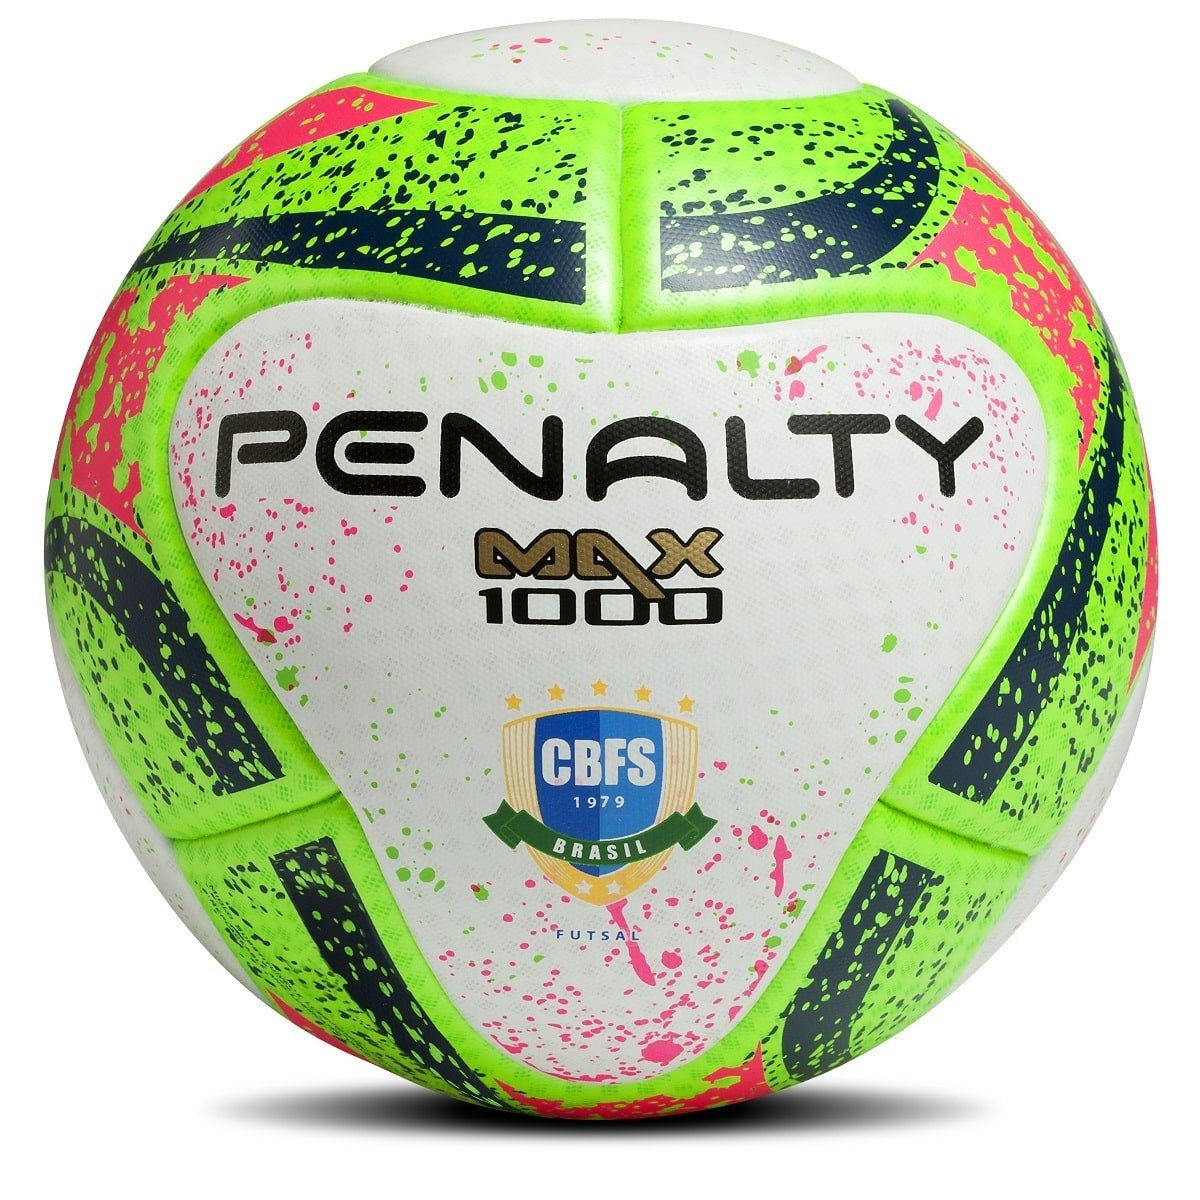 Características. Marca Penalty  Modelo Max 1000  Tipo de superfície Futsal aea8c07f34805